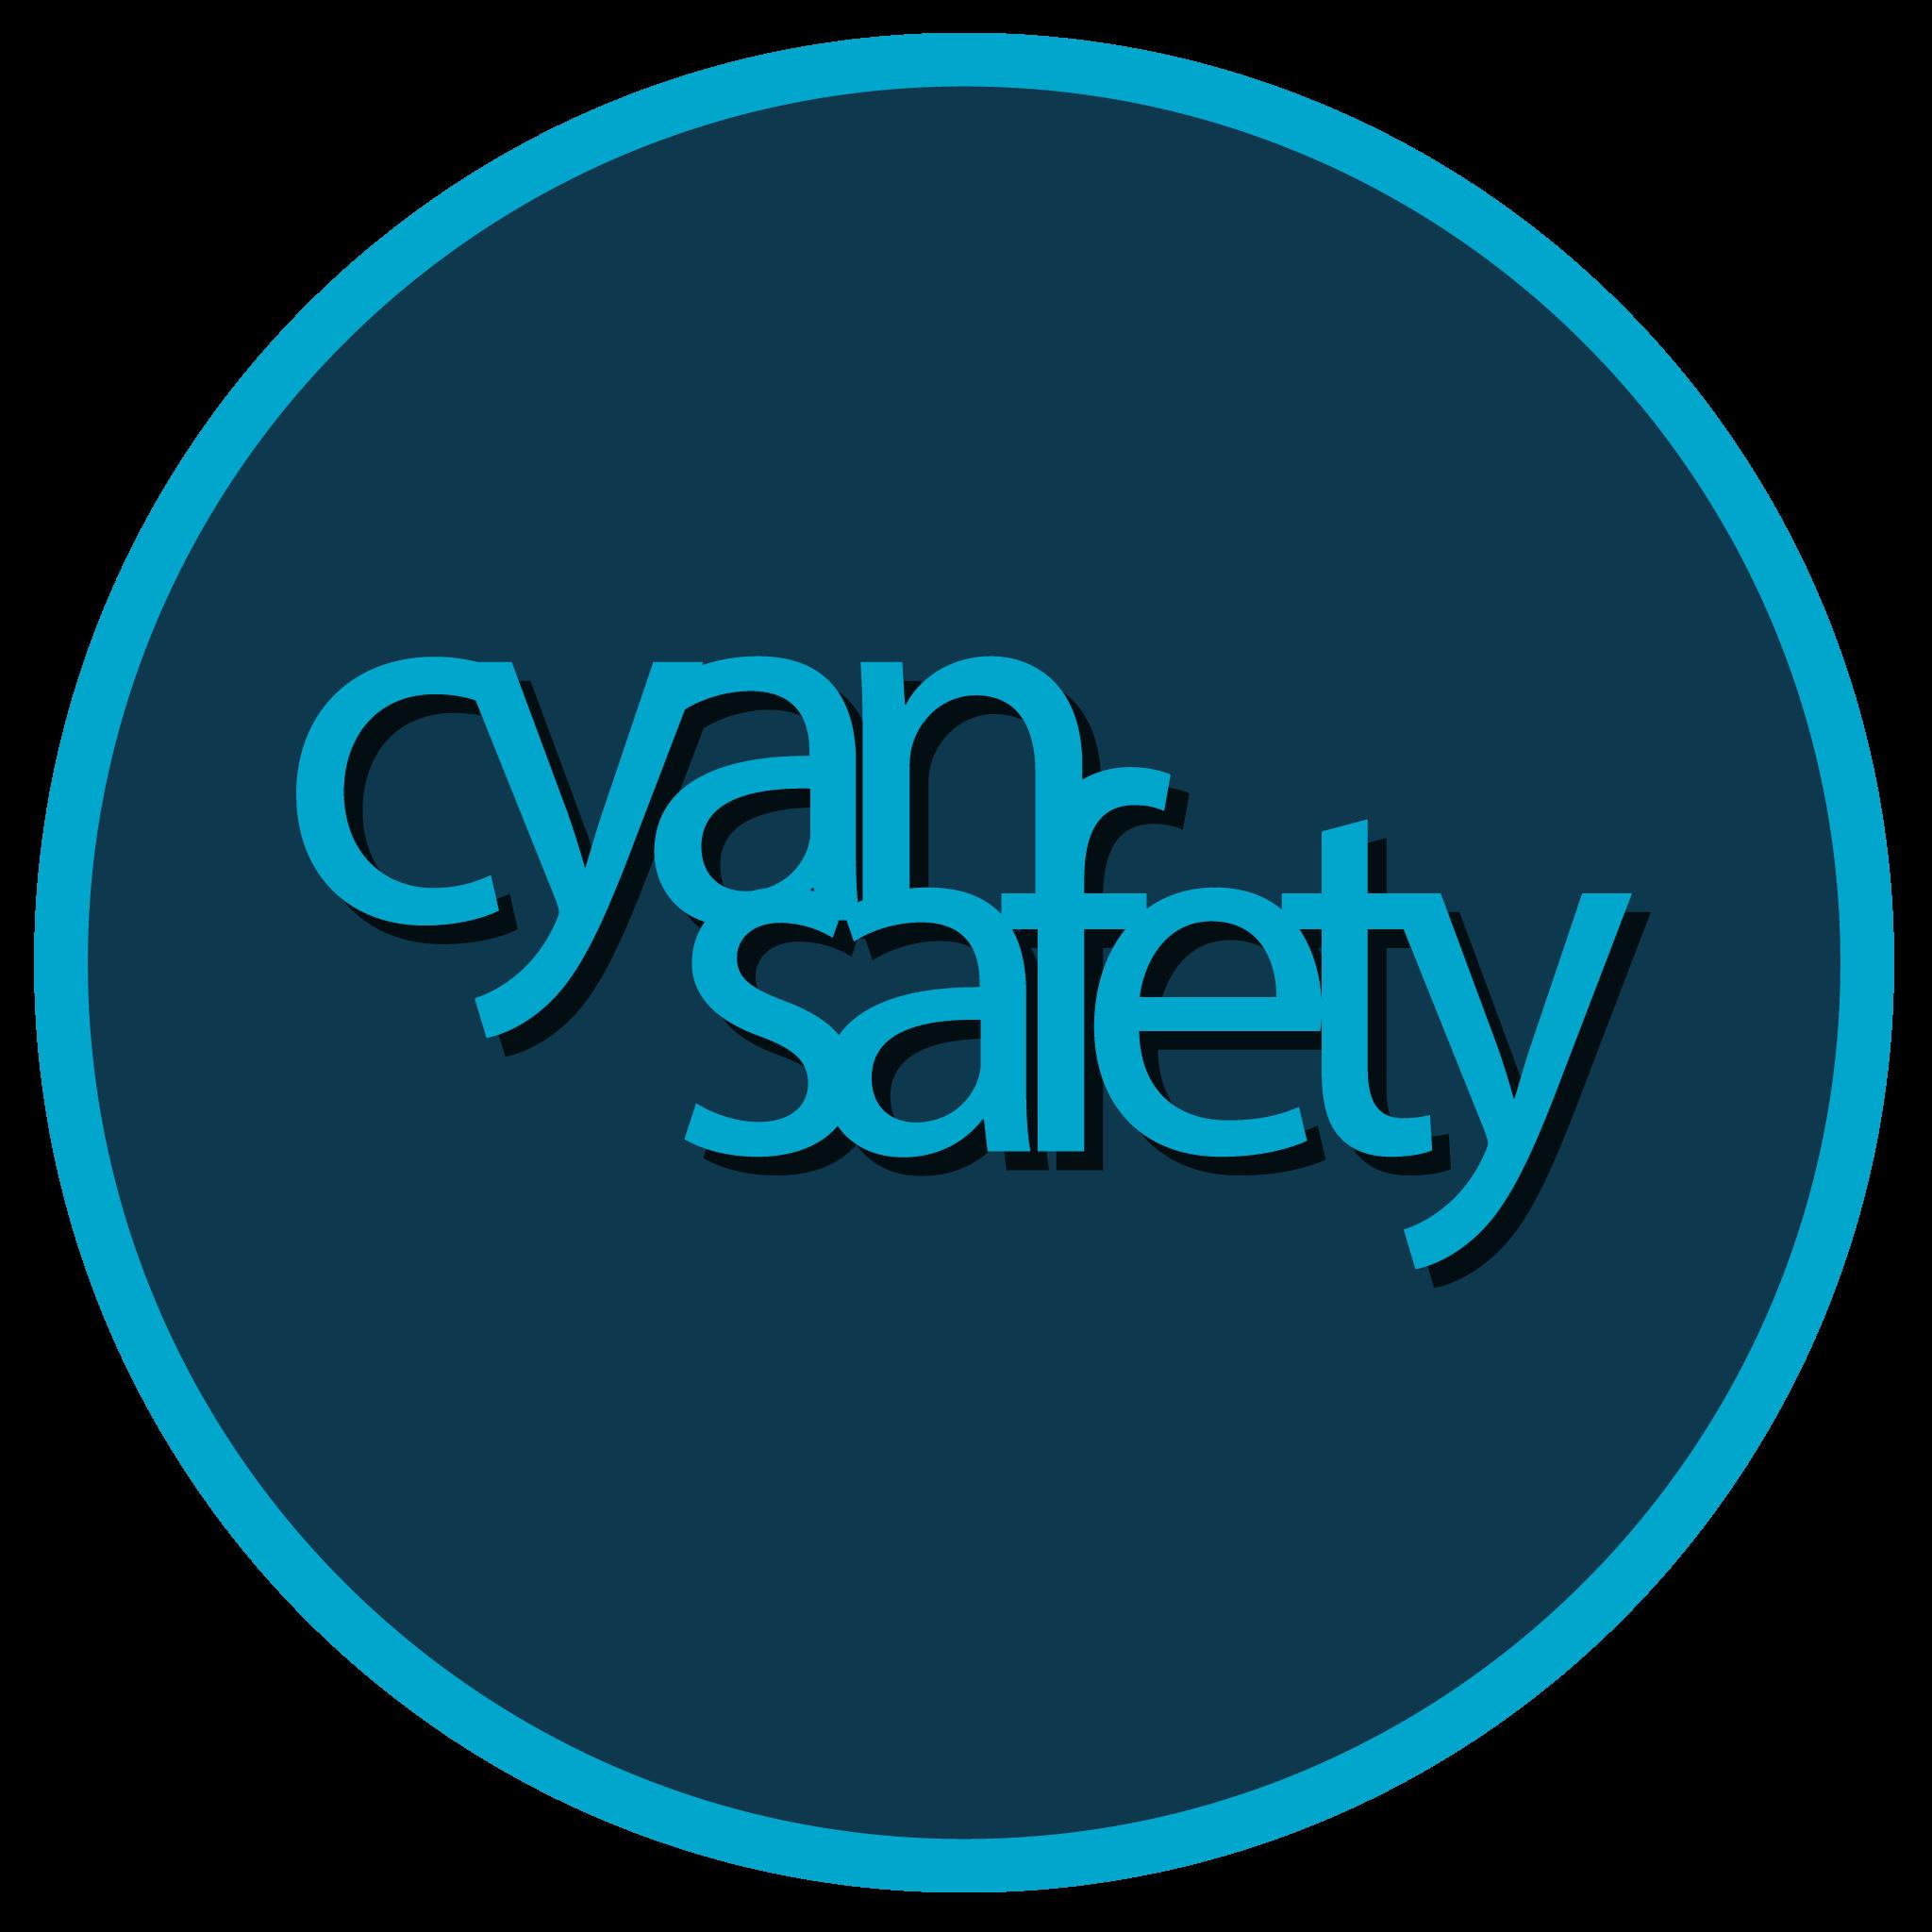 Cyan Safety